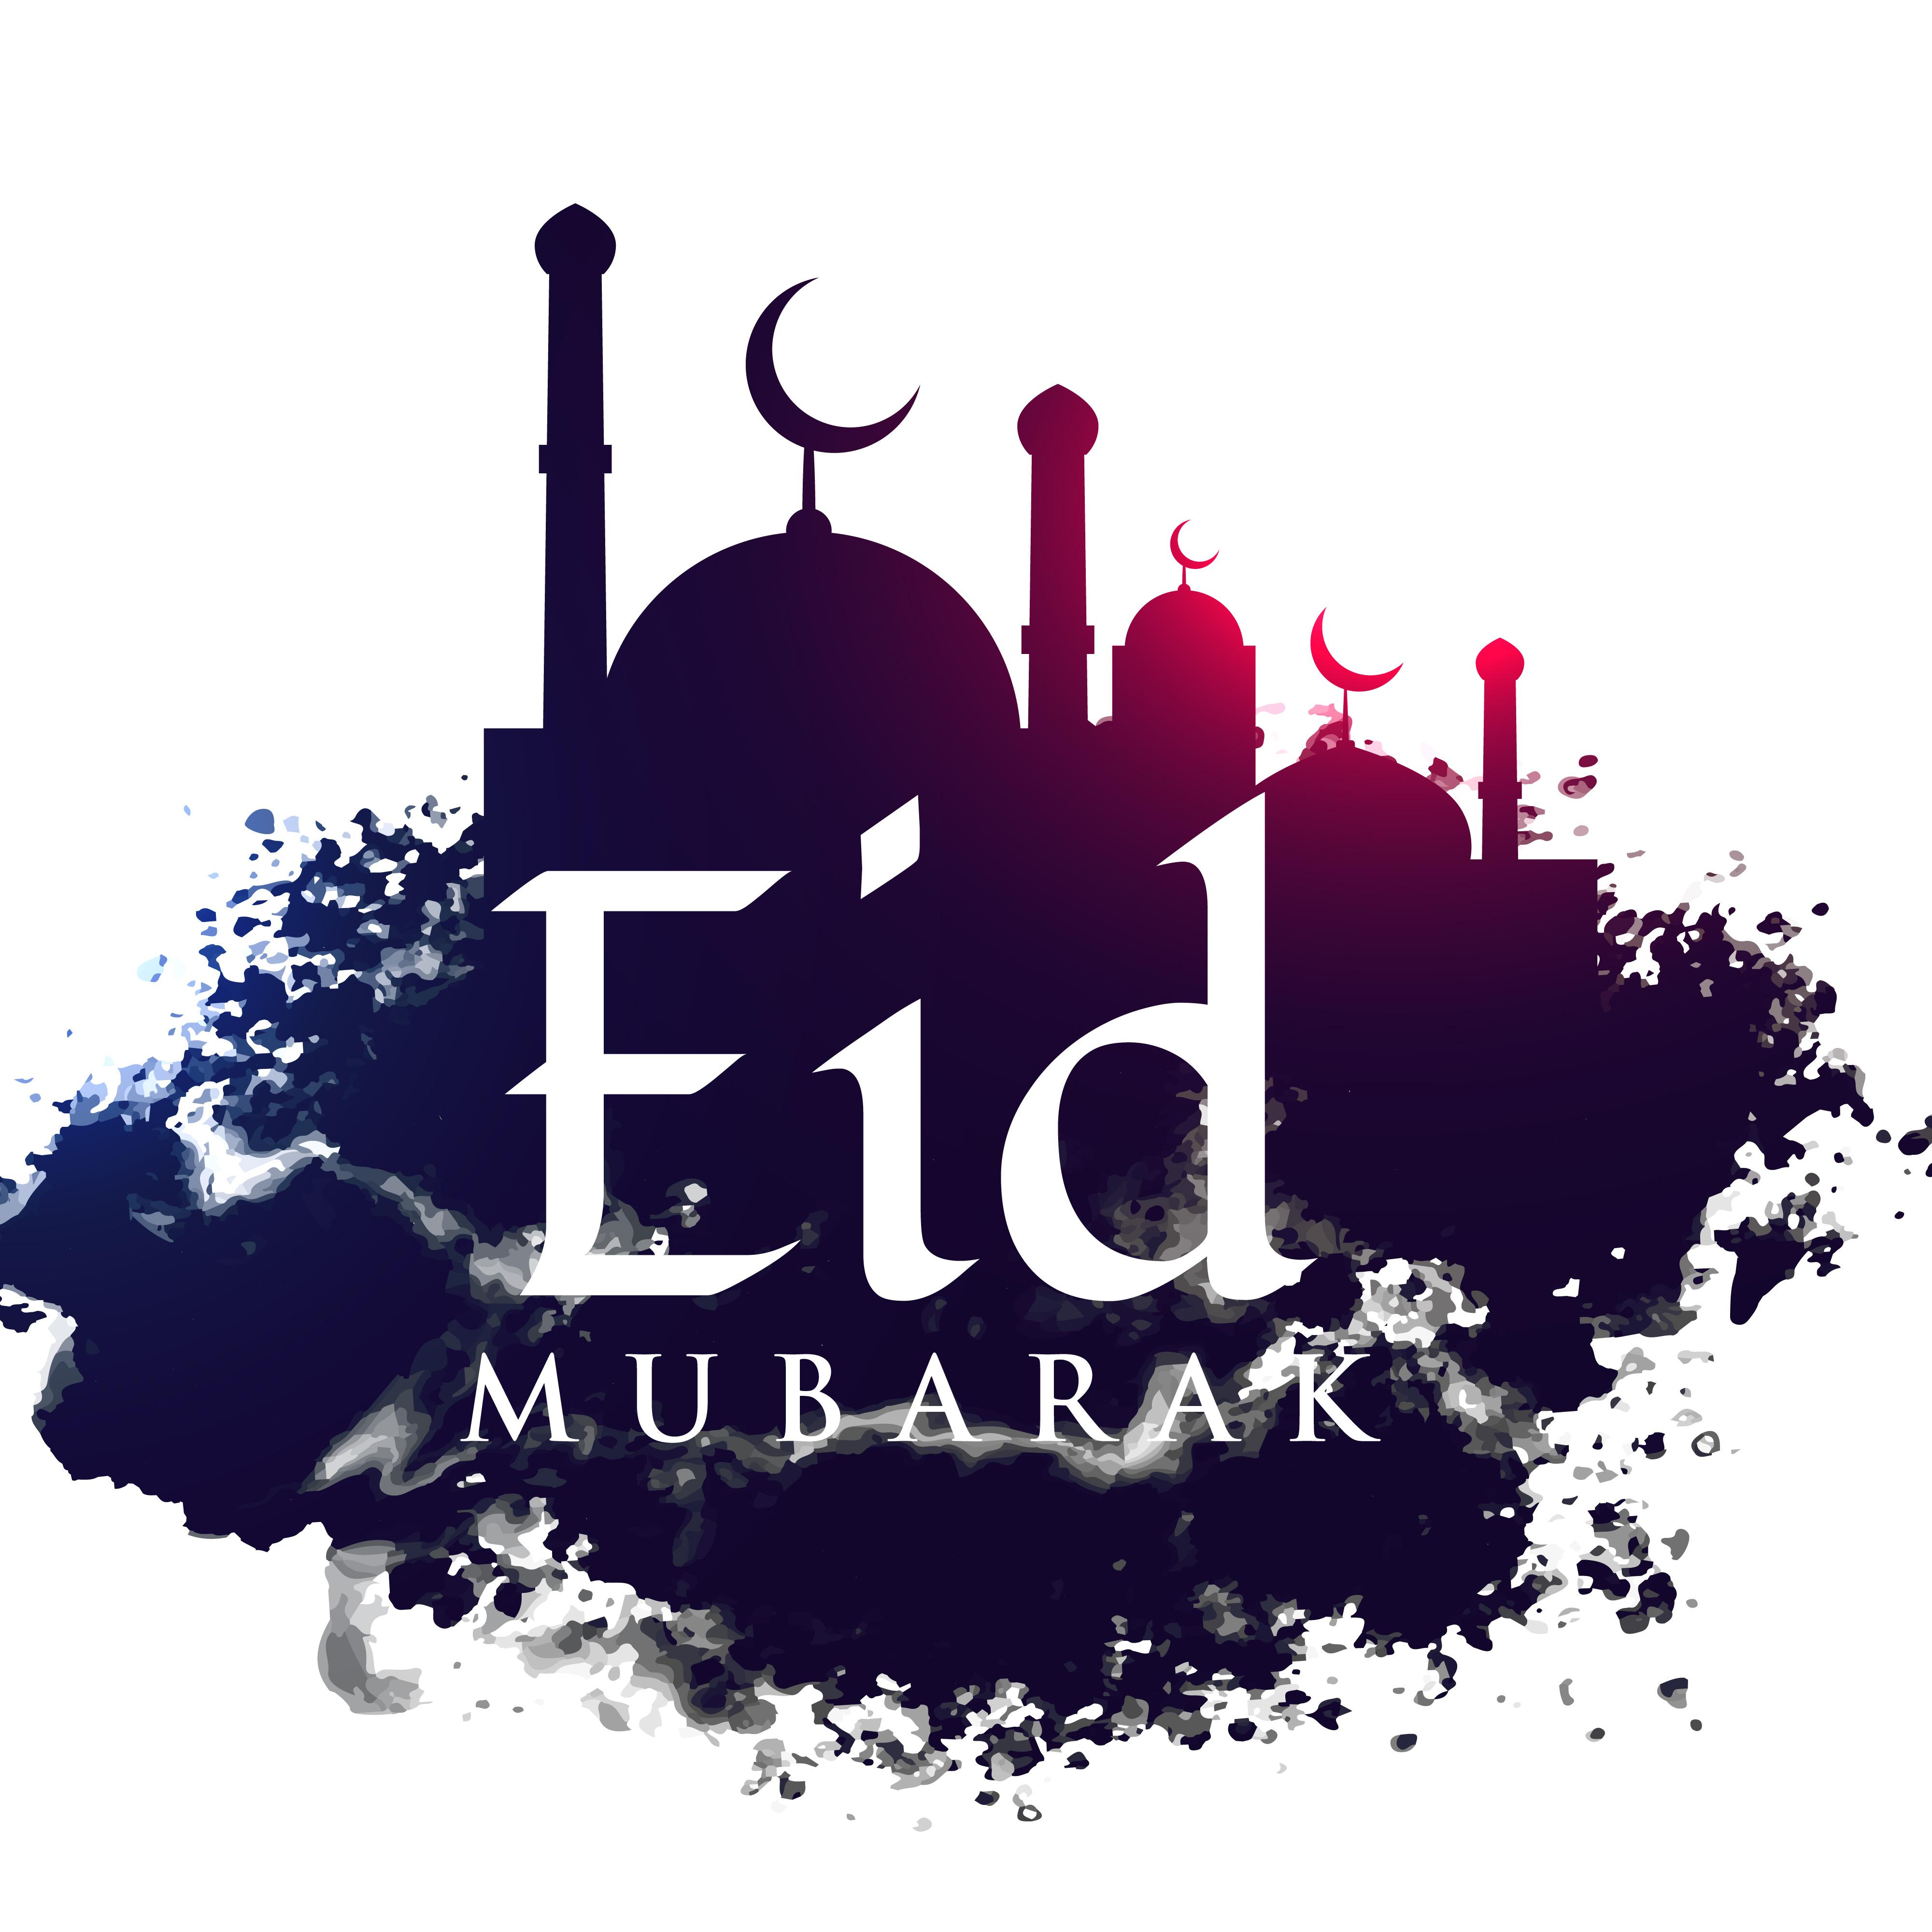 Sydney Eid-ul-Fitr Festival 2015 |Eid Festival Poster